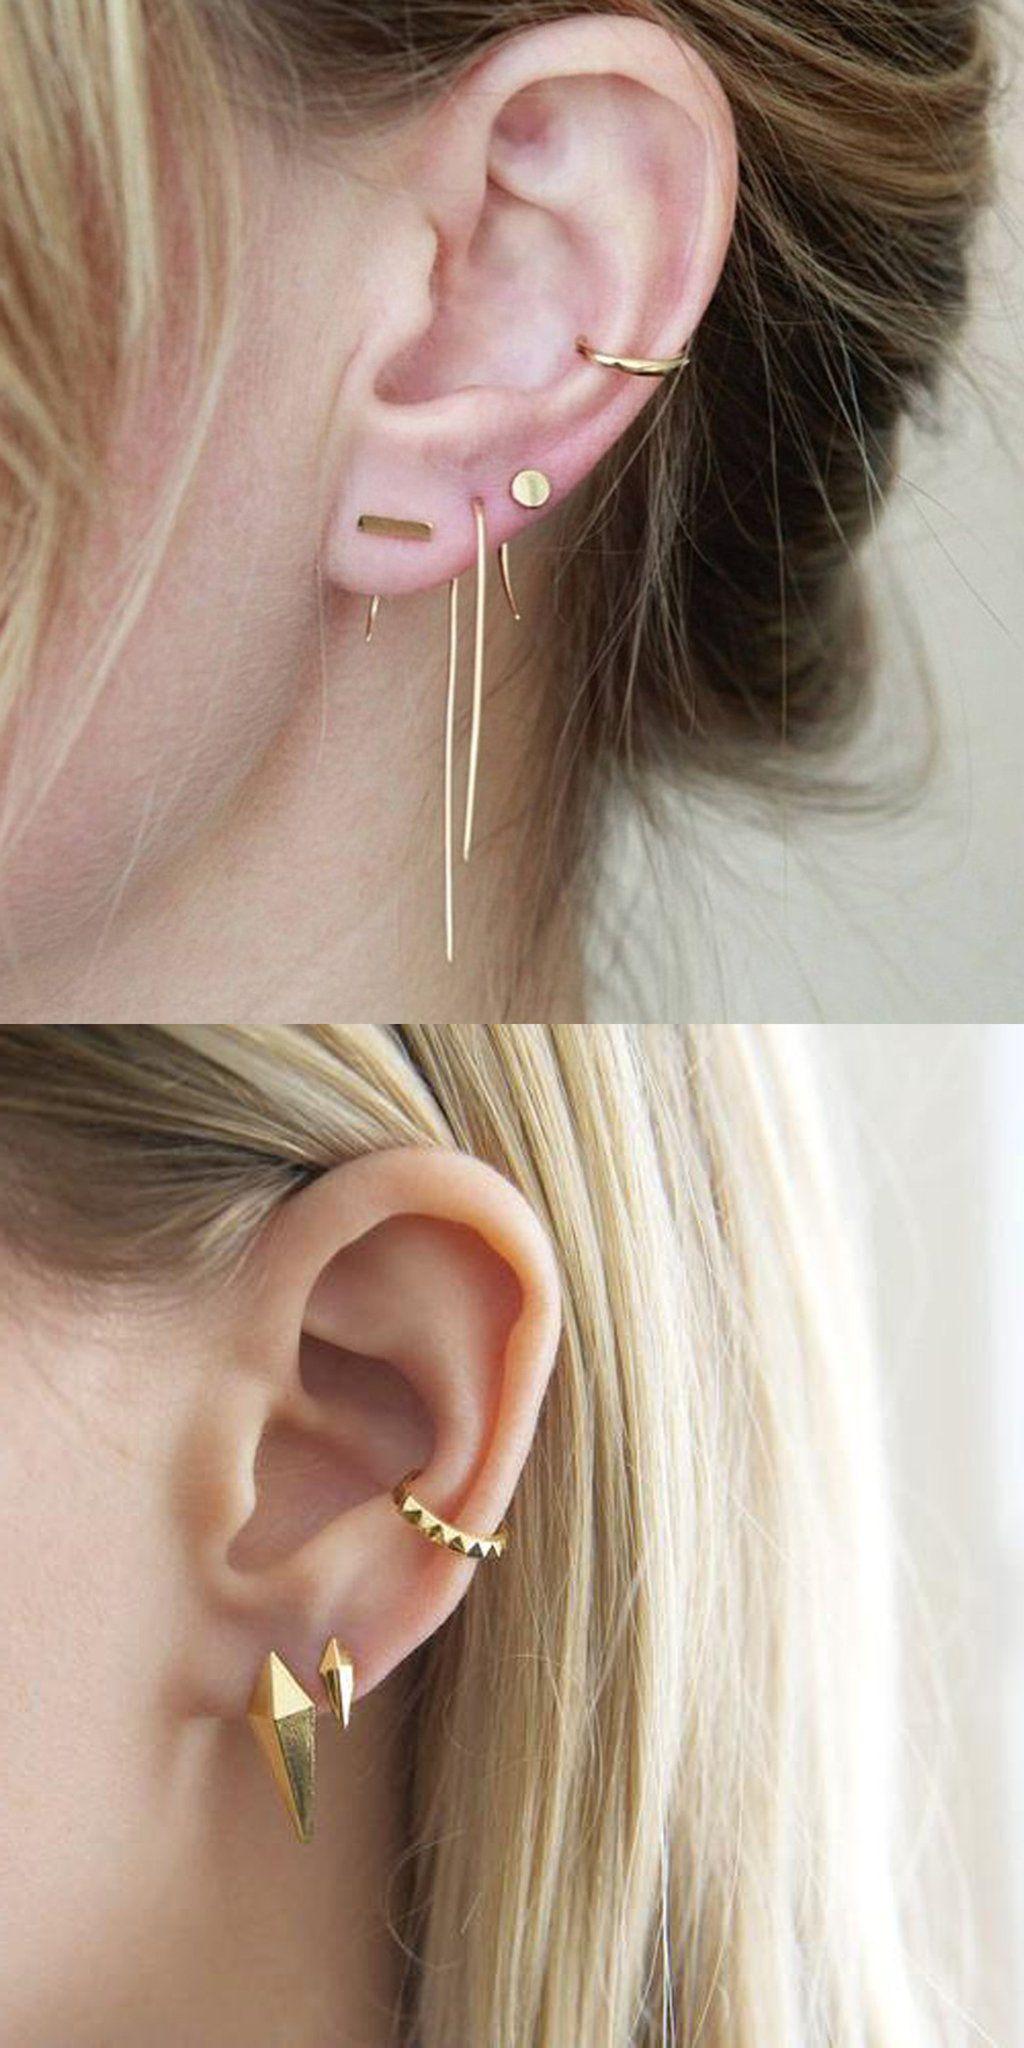 30 ear piercing ideas that are trending now percing oreilles et bijou. Black Bedroom Furniture Sets. Home Design Ideas